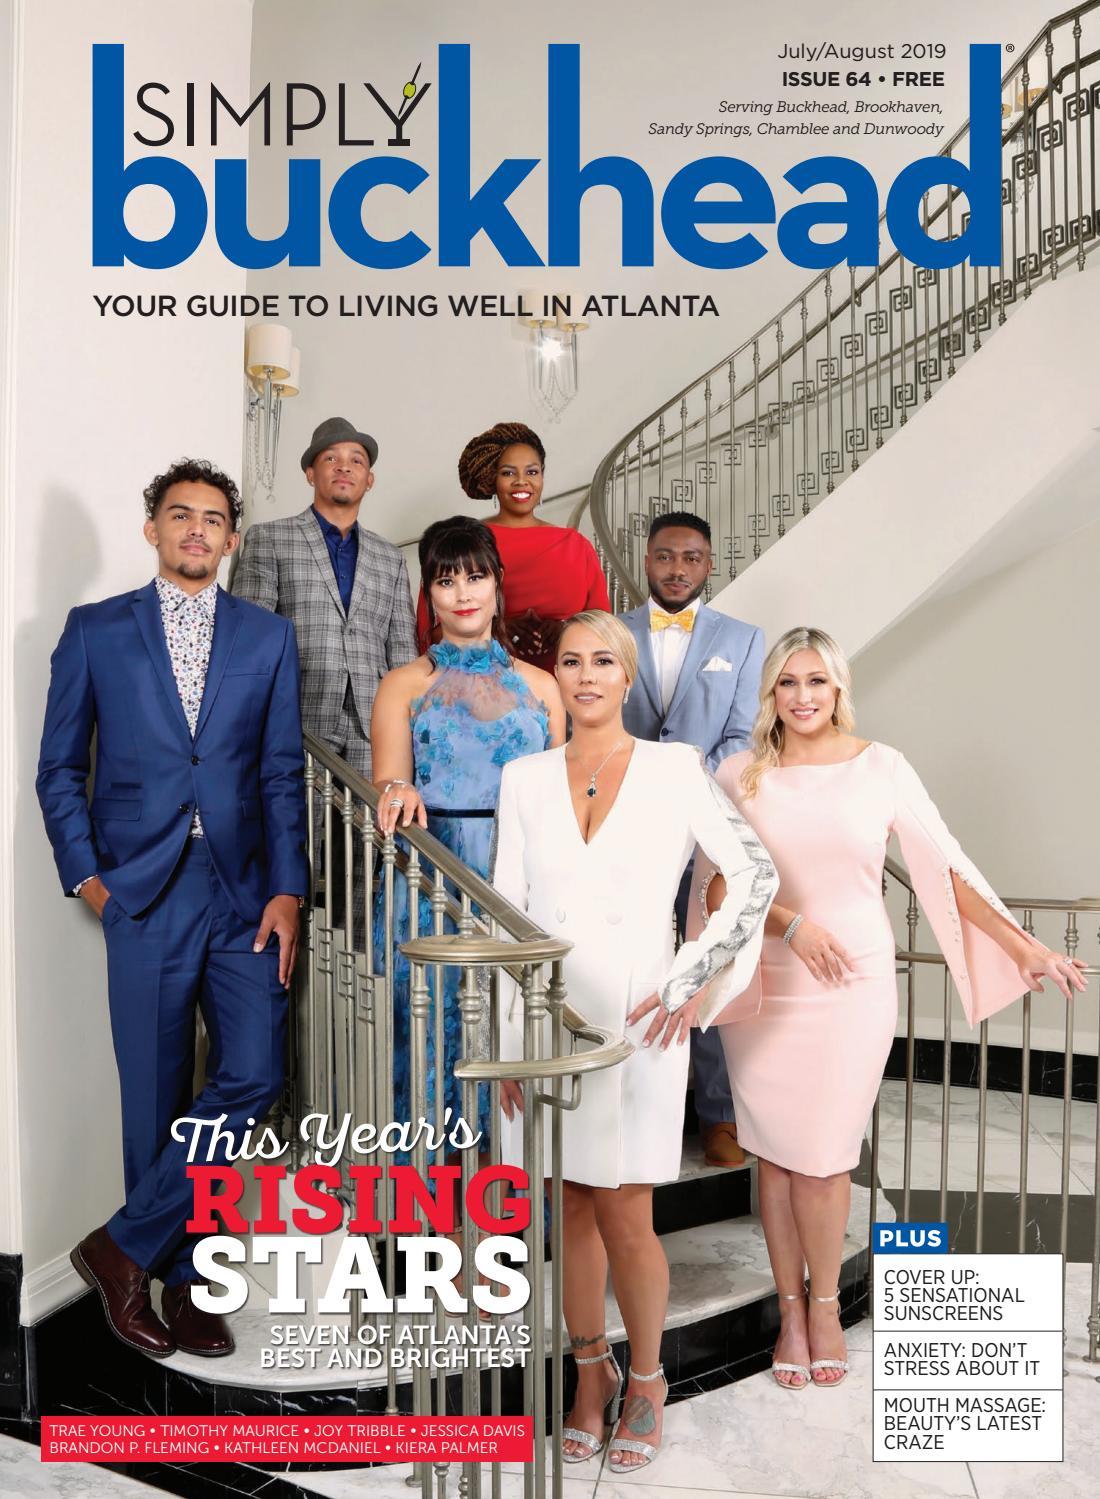 Simply Buckhead July/August 2019 by Simply Buckhead - issuu